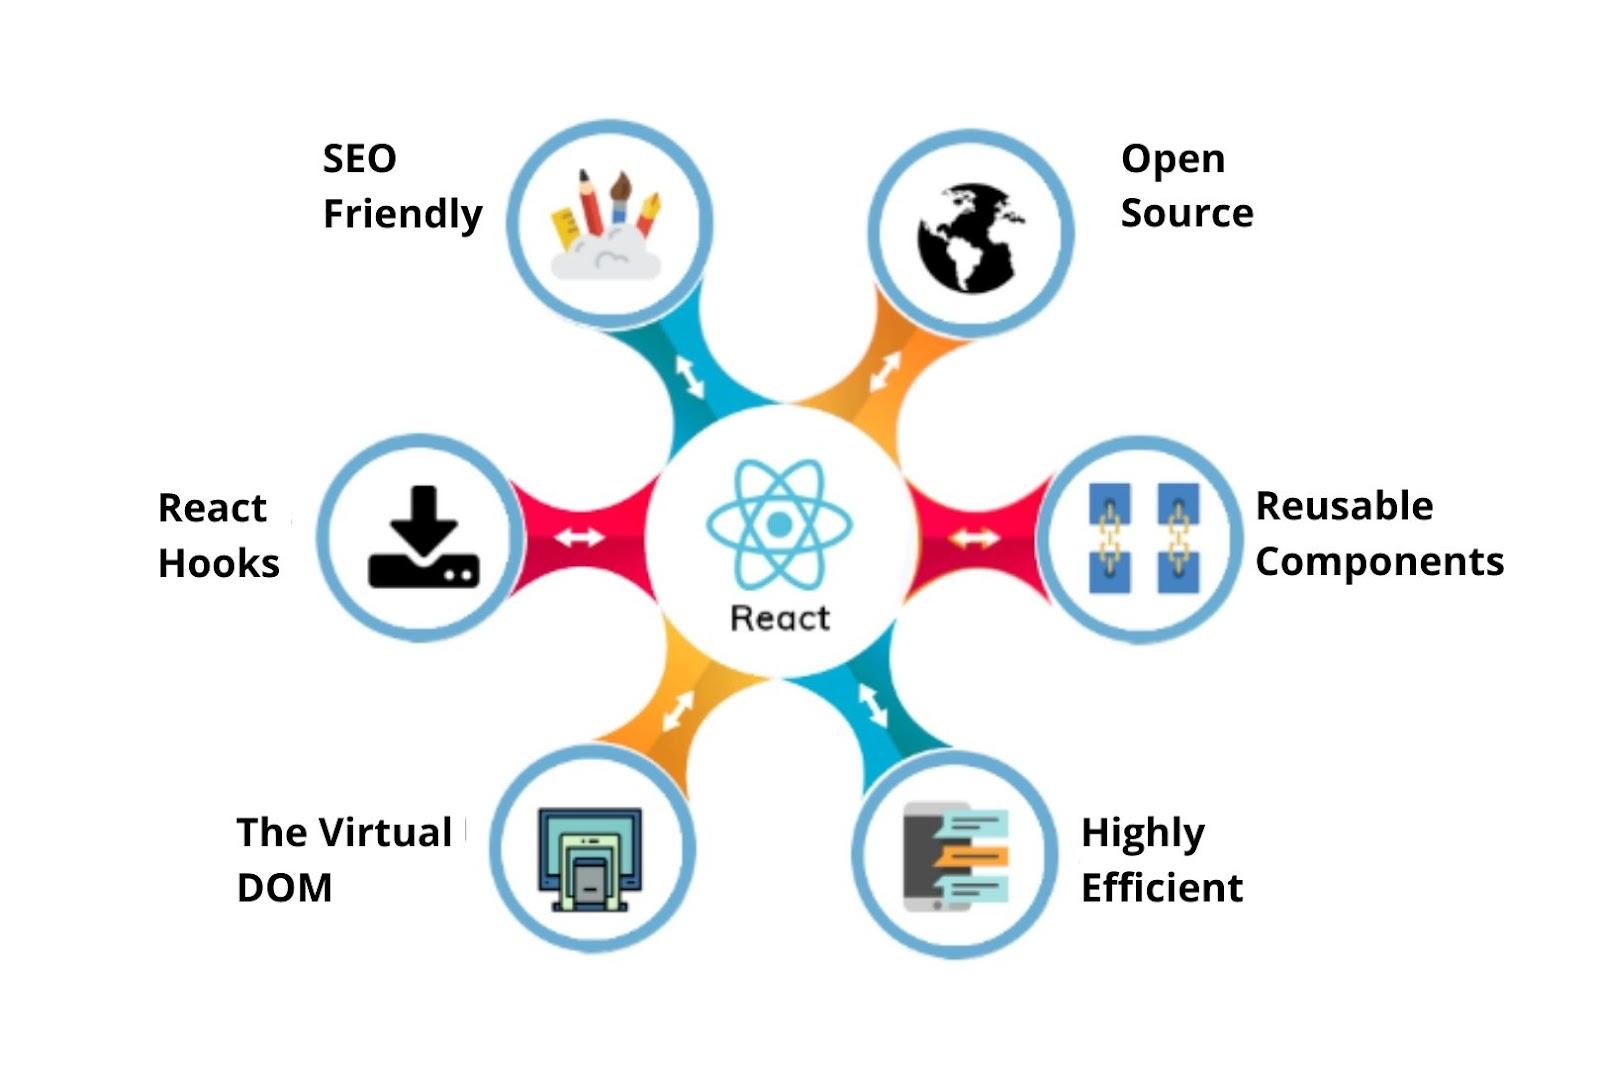 Pros of reactjs web development